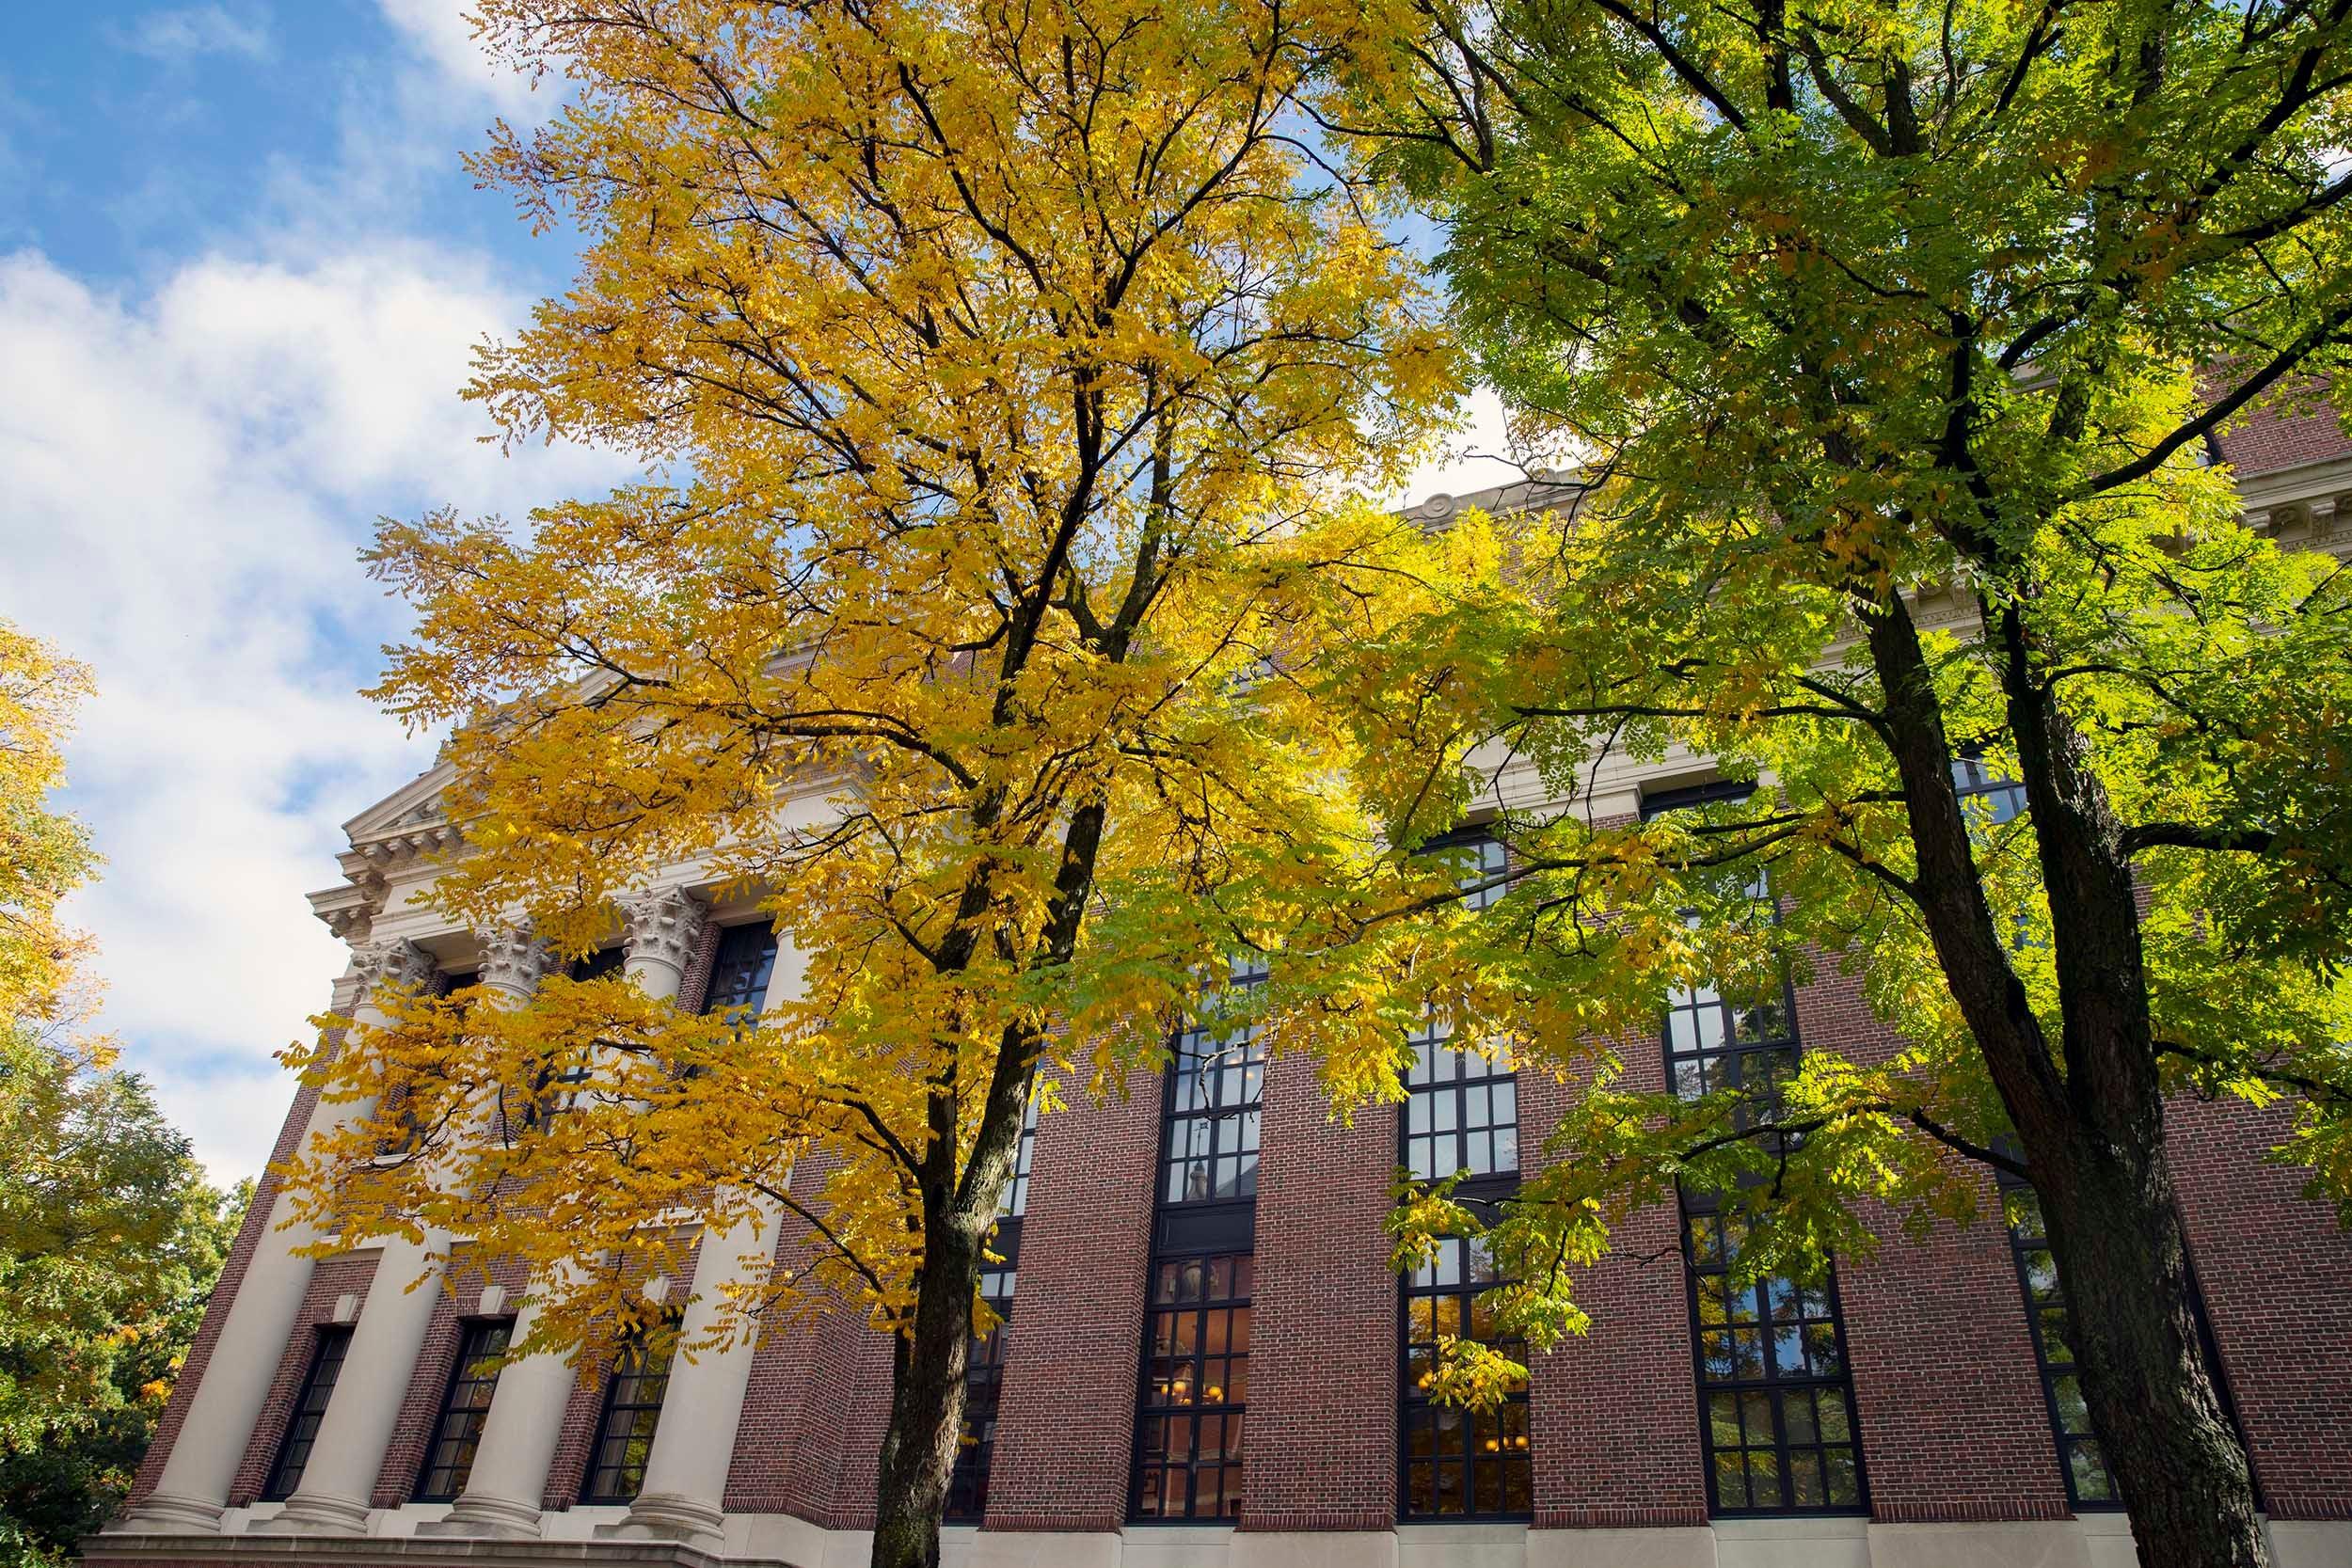 Trees frame The Widener Library in Harvard Yard.